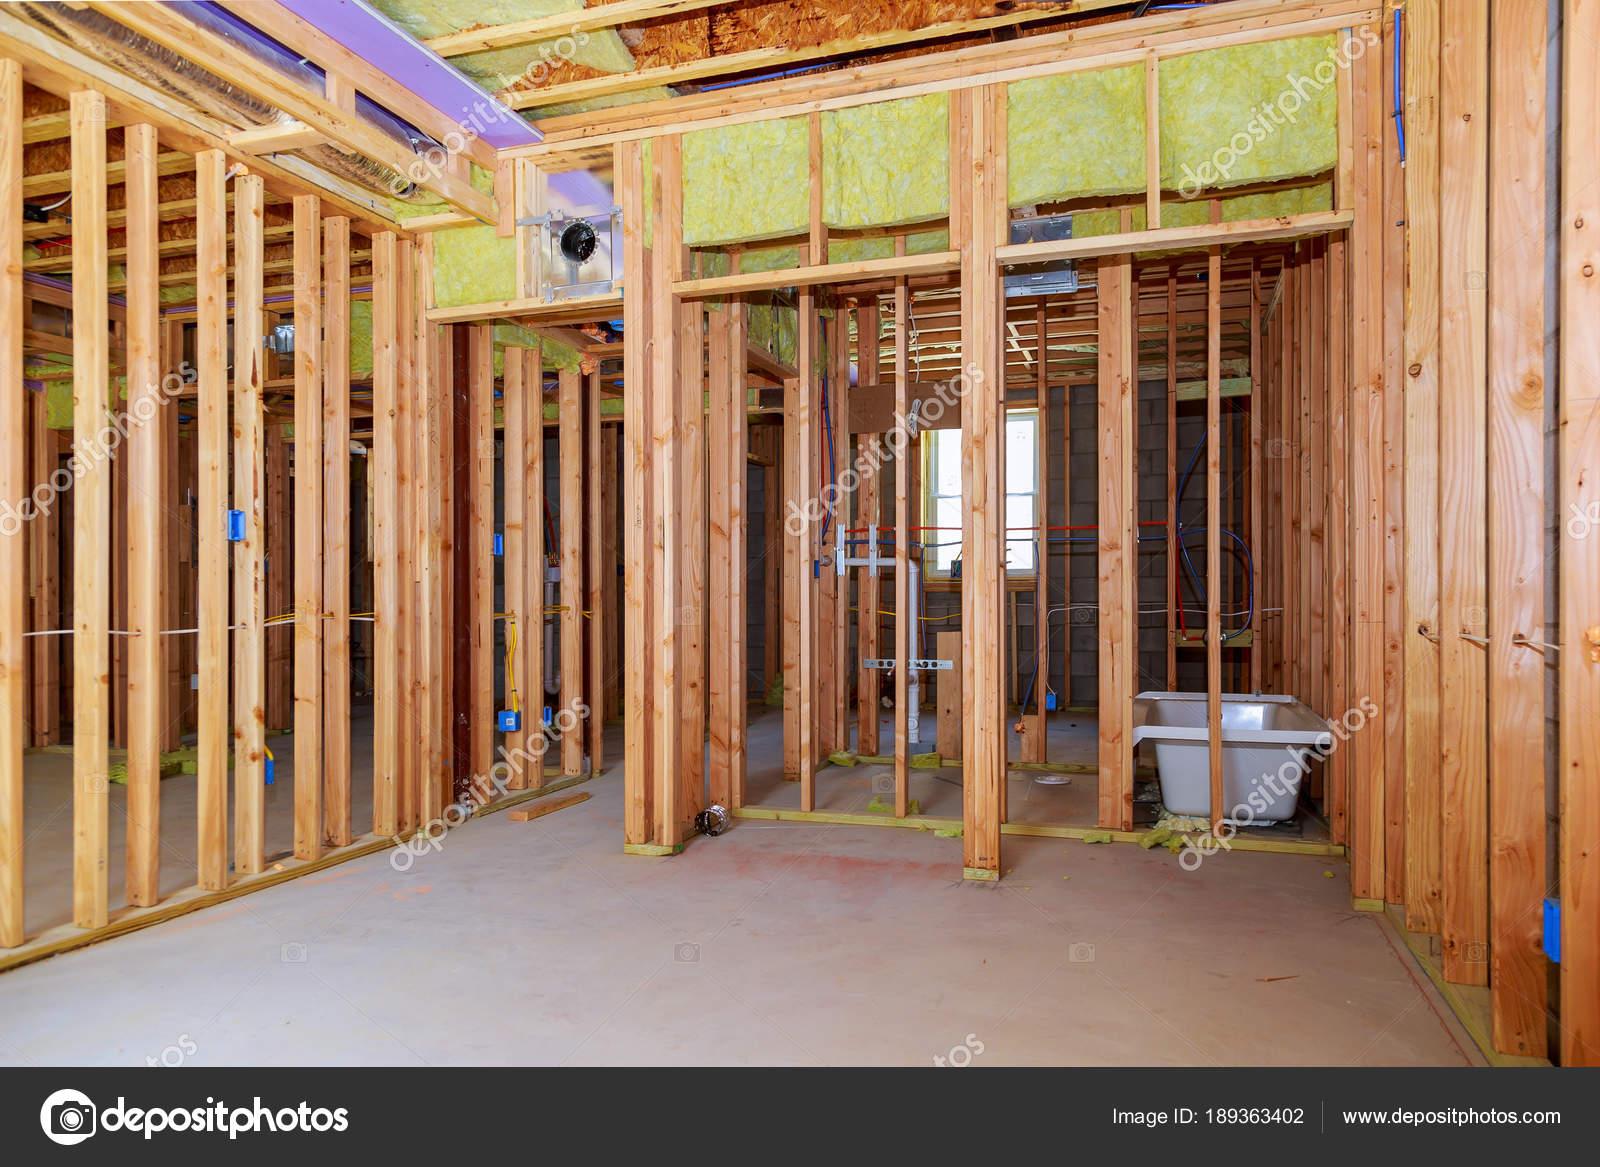 Onder De Kelders : Interieur wand framing met piping installatie in de kelder badkamers